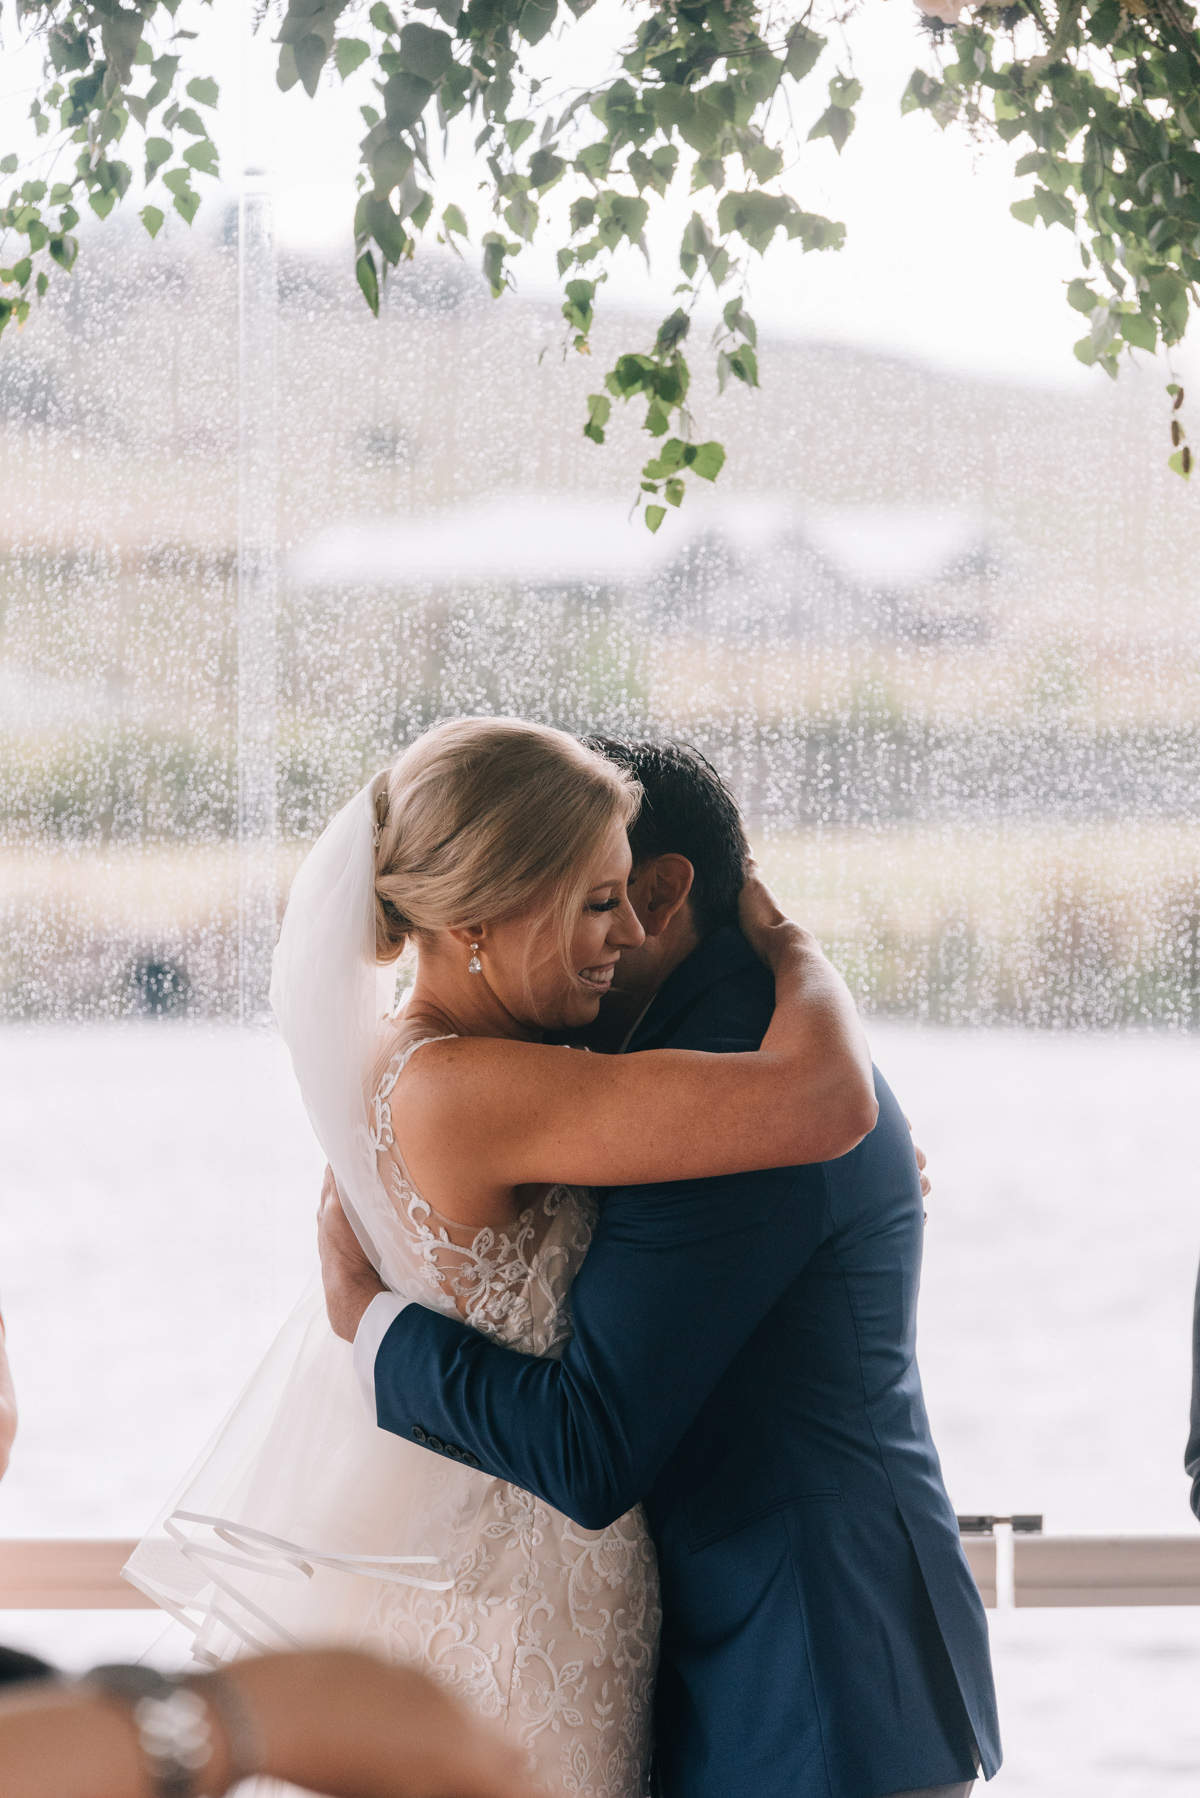 Wedding-Photohraphy-Tasmania-Josef-Chromy-39.jpg